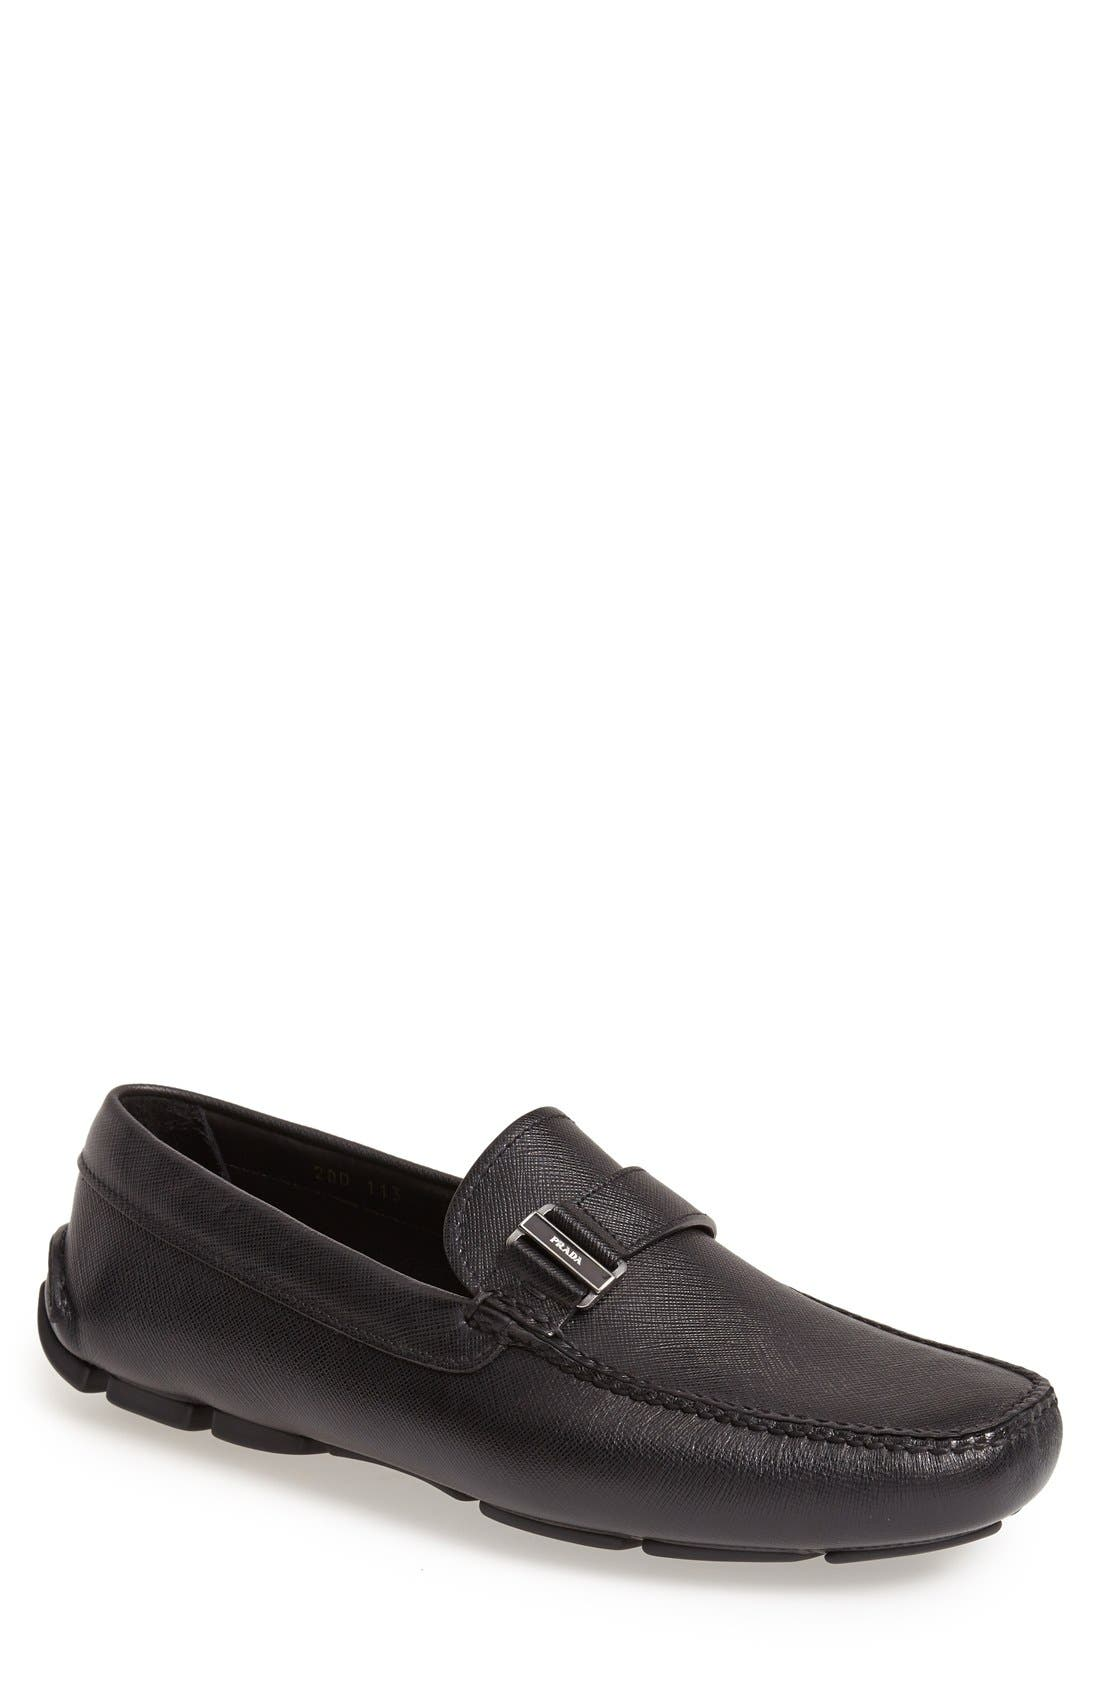 Prada Saffiano Leather Driving Shoe (Men)